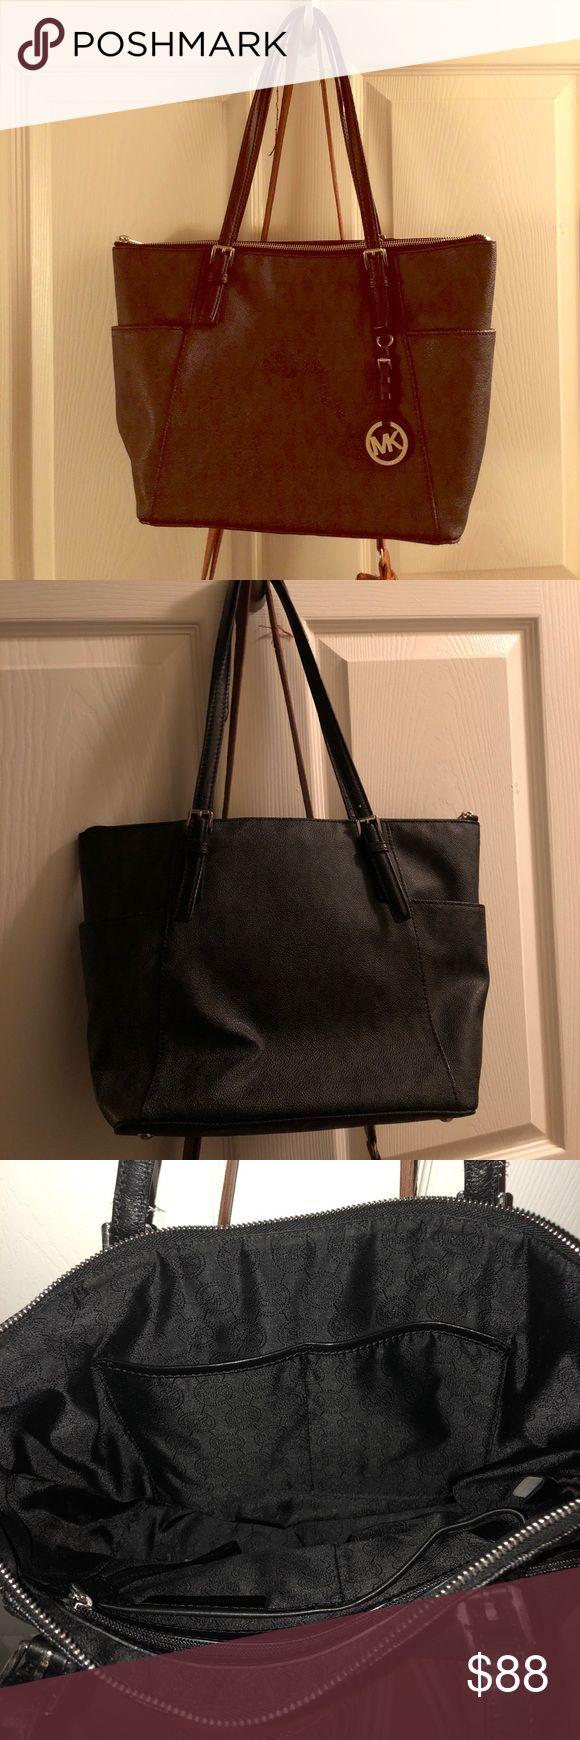 Black Michale Kors jet set bag Lightly used Michael Kors jet set medium purse with mk pattern lightly used KORS Michael Kors Bags Totes